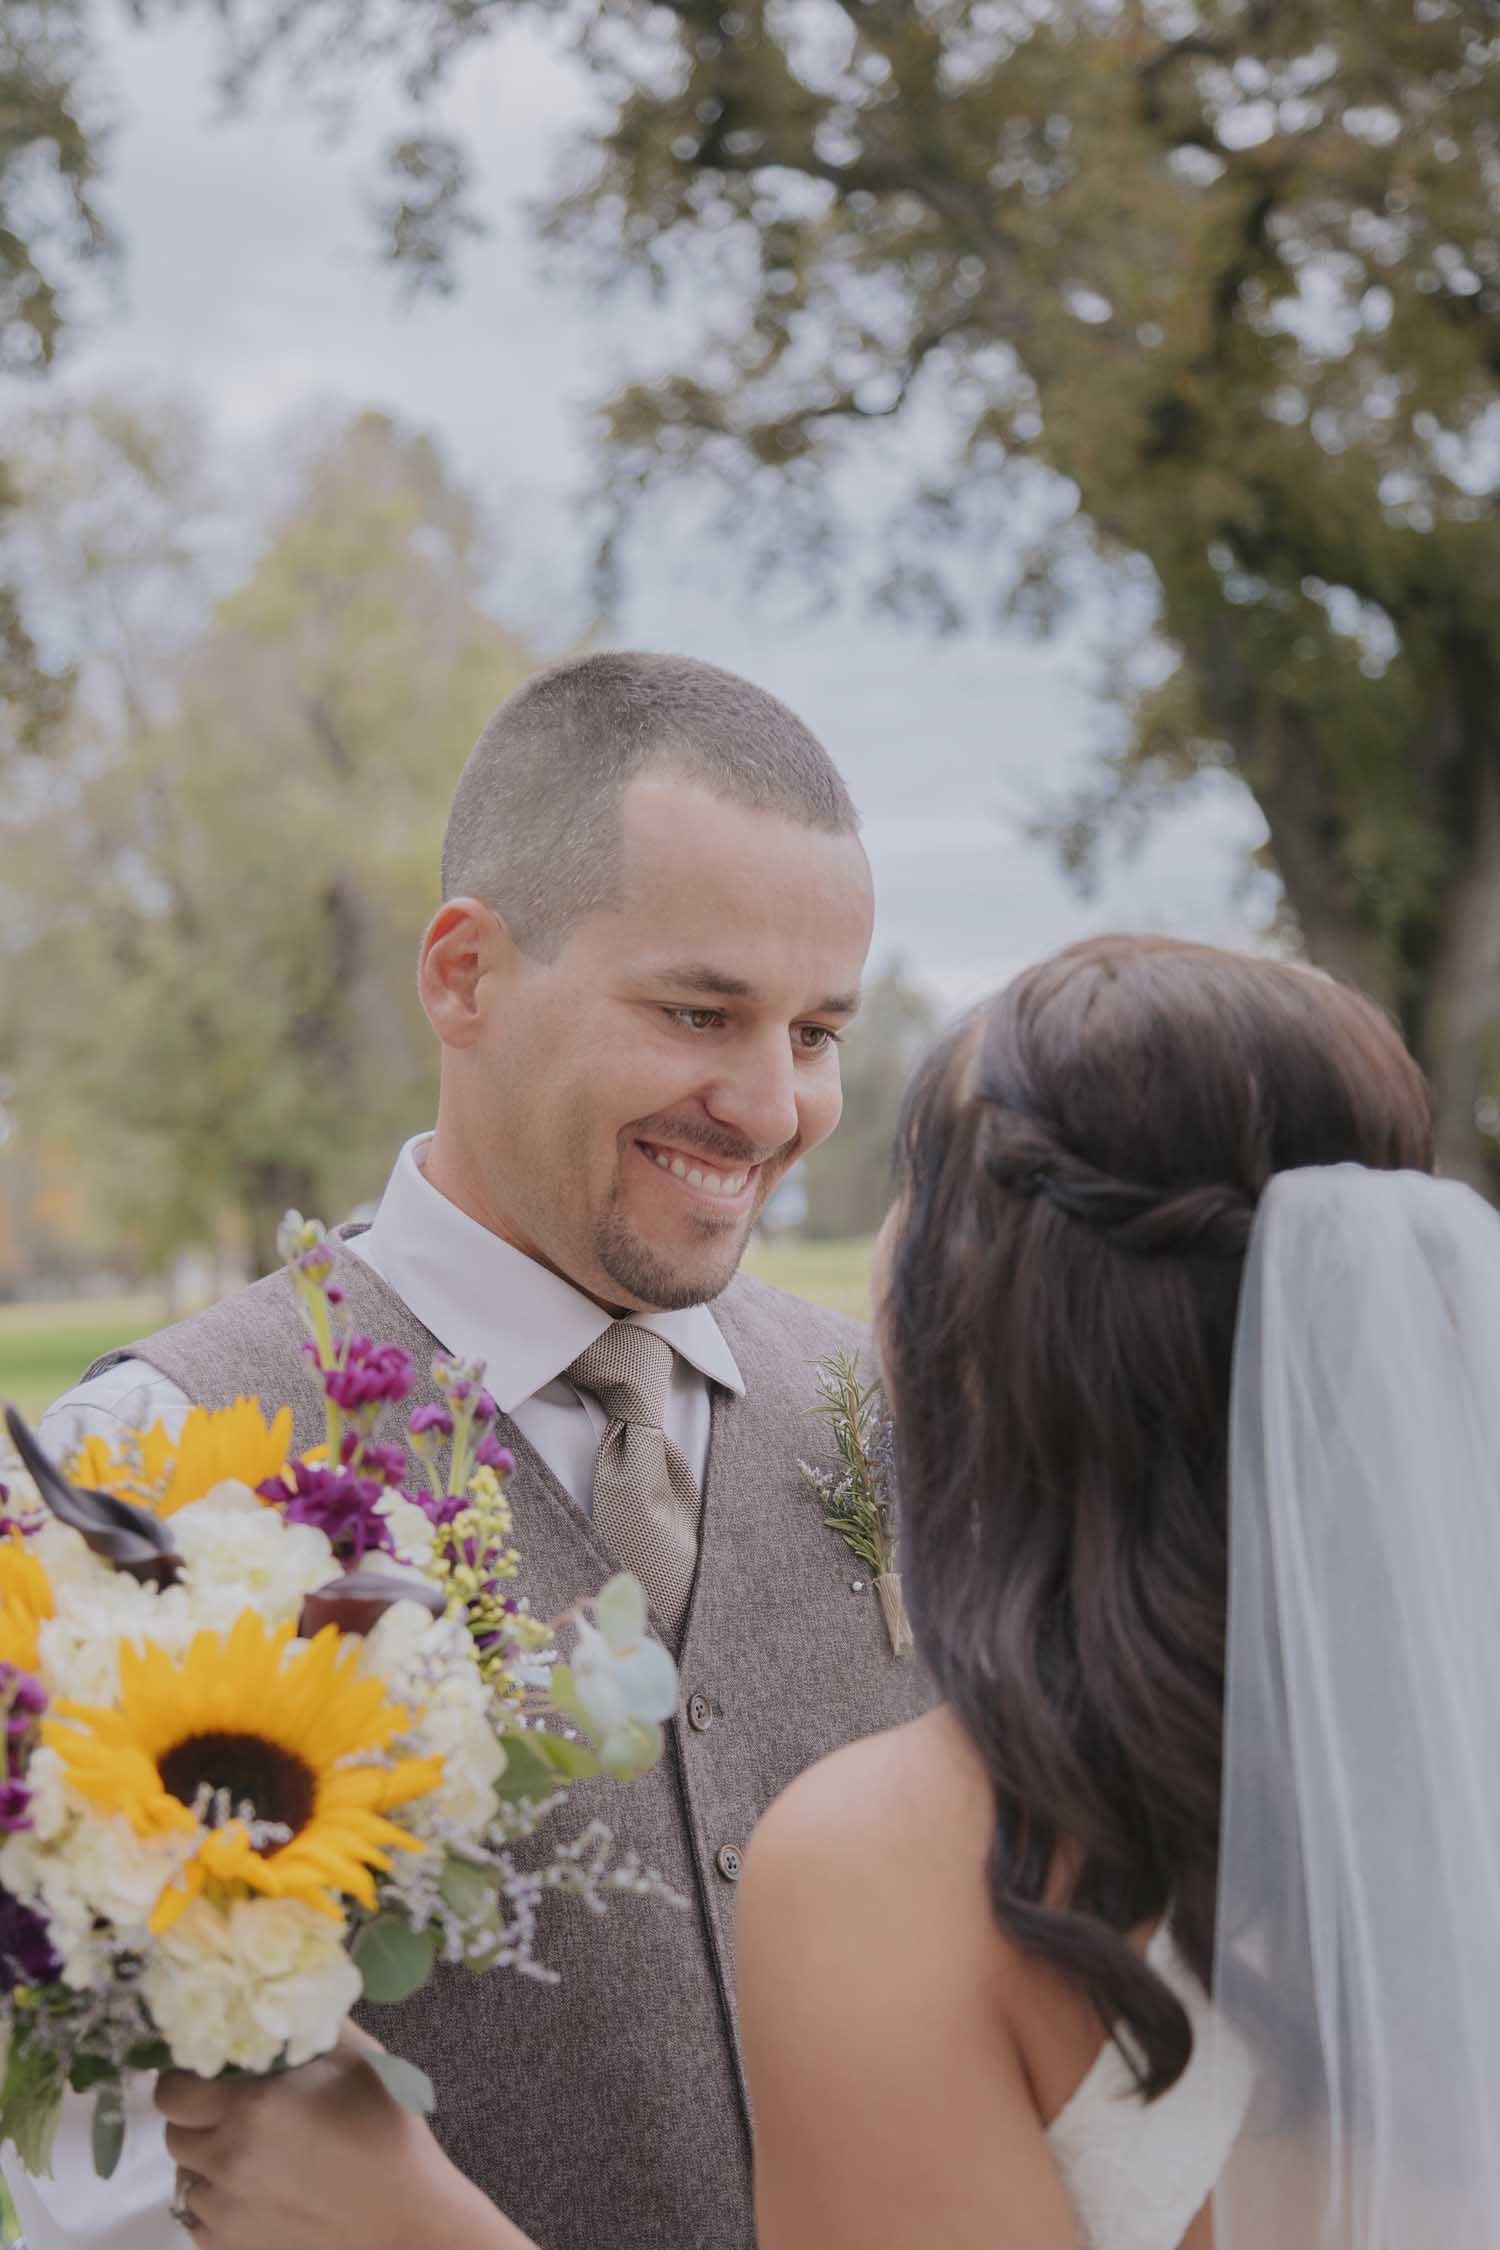 Bonnie-Scott-Rustic-Wedding-Chico-Ca-Butte-Creek-Country-Club1Bonnie-Scott-Rustic-Wedding-Chico-Ca-Butte-Creek-Country-Club3-2.jpg